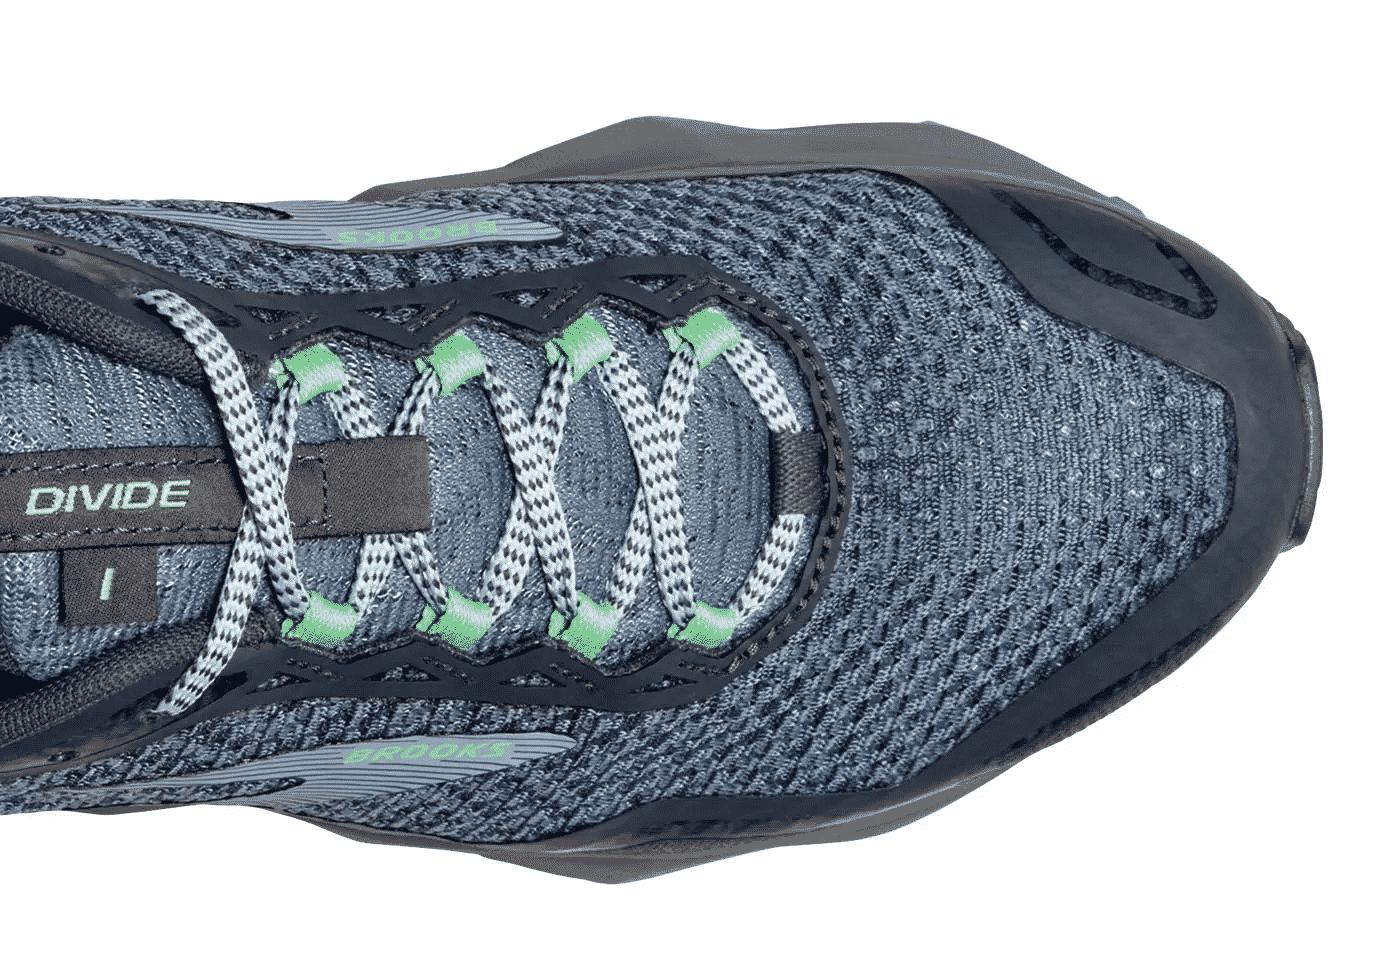 Brooks-Divide-trail-chaussure-running-runpack-femme-7